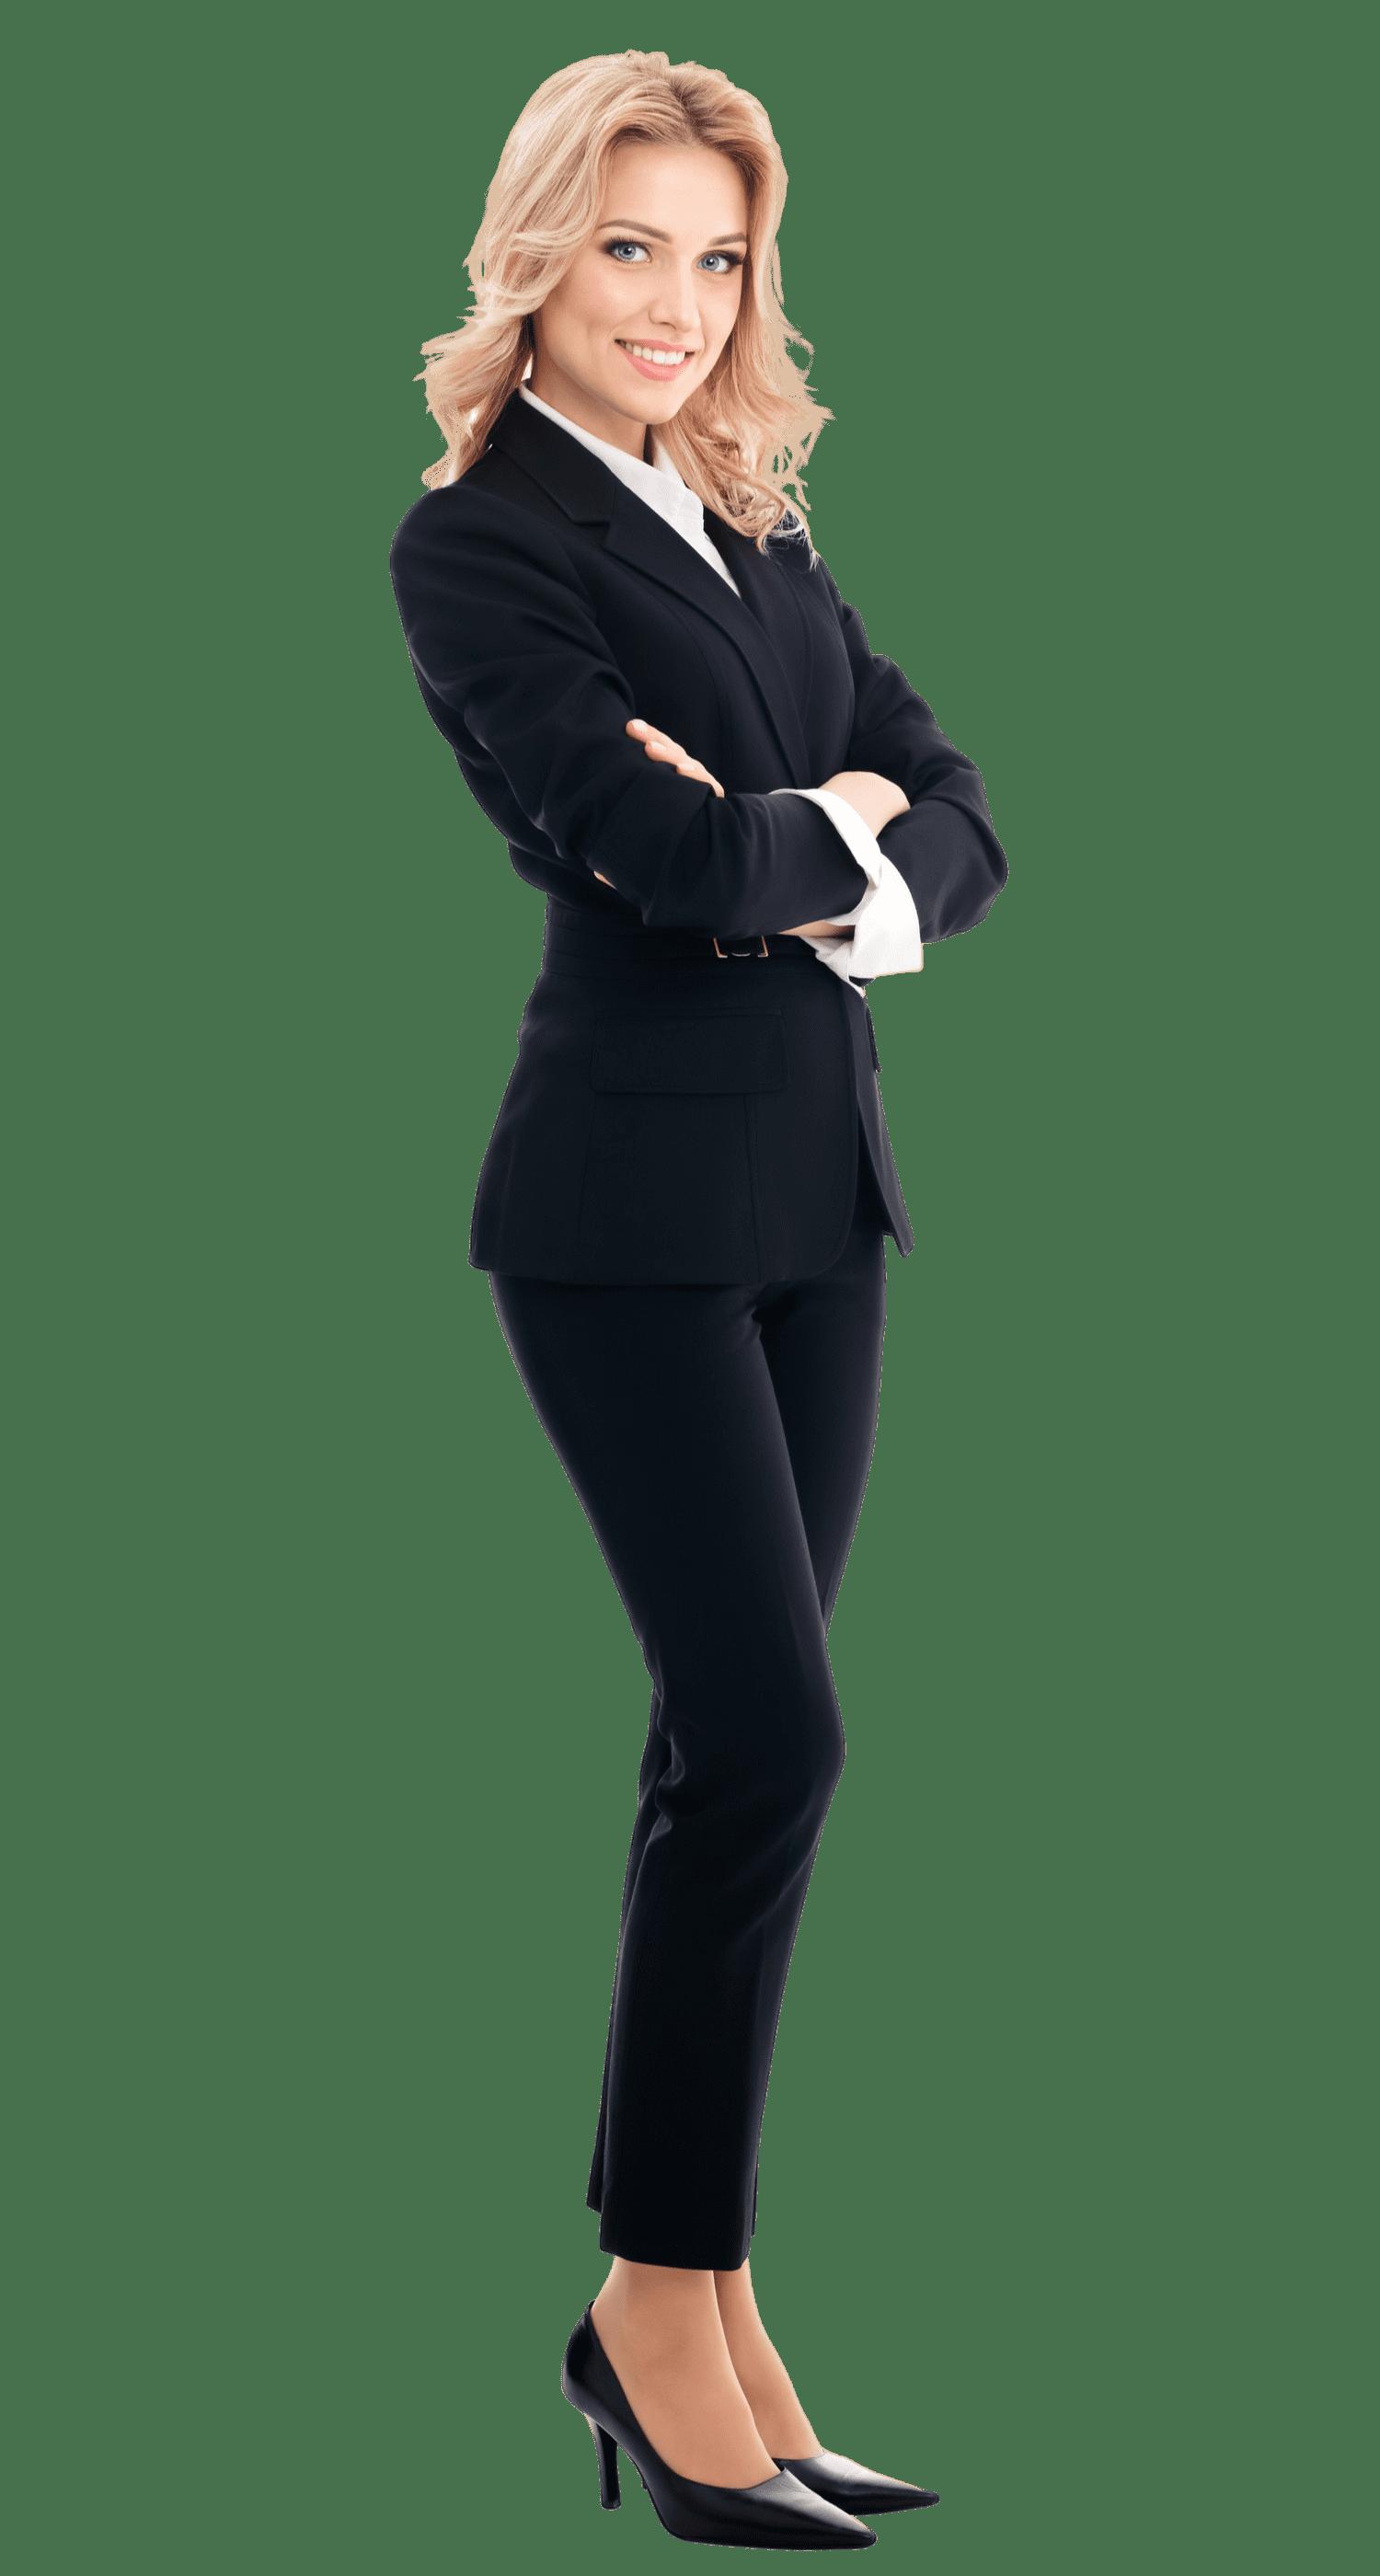 Business woman (transparent background)